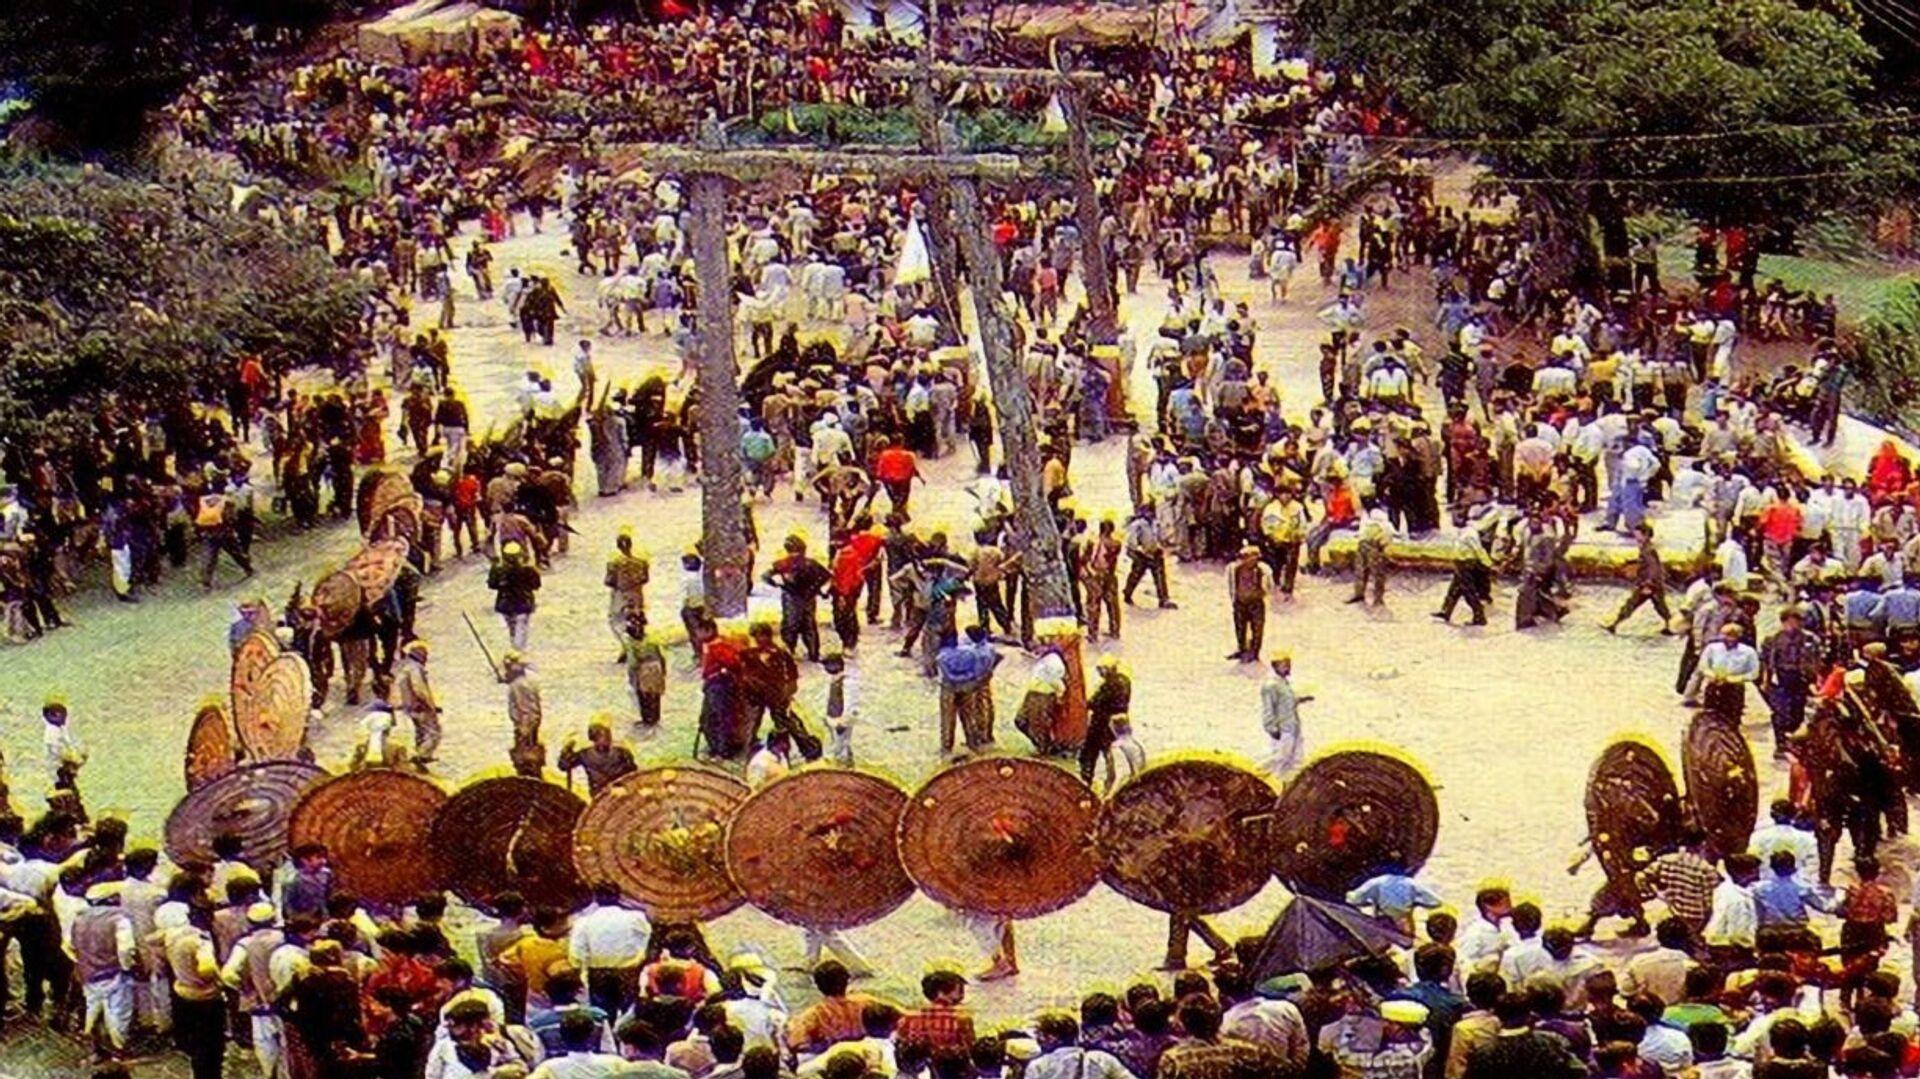 Il festival di Bagwal, India - Sputnik Italia, 1920, 23.08.2021